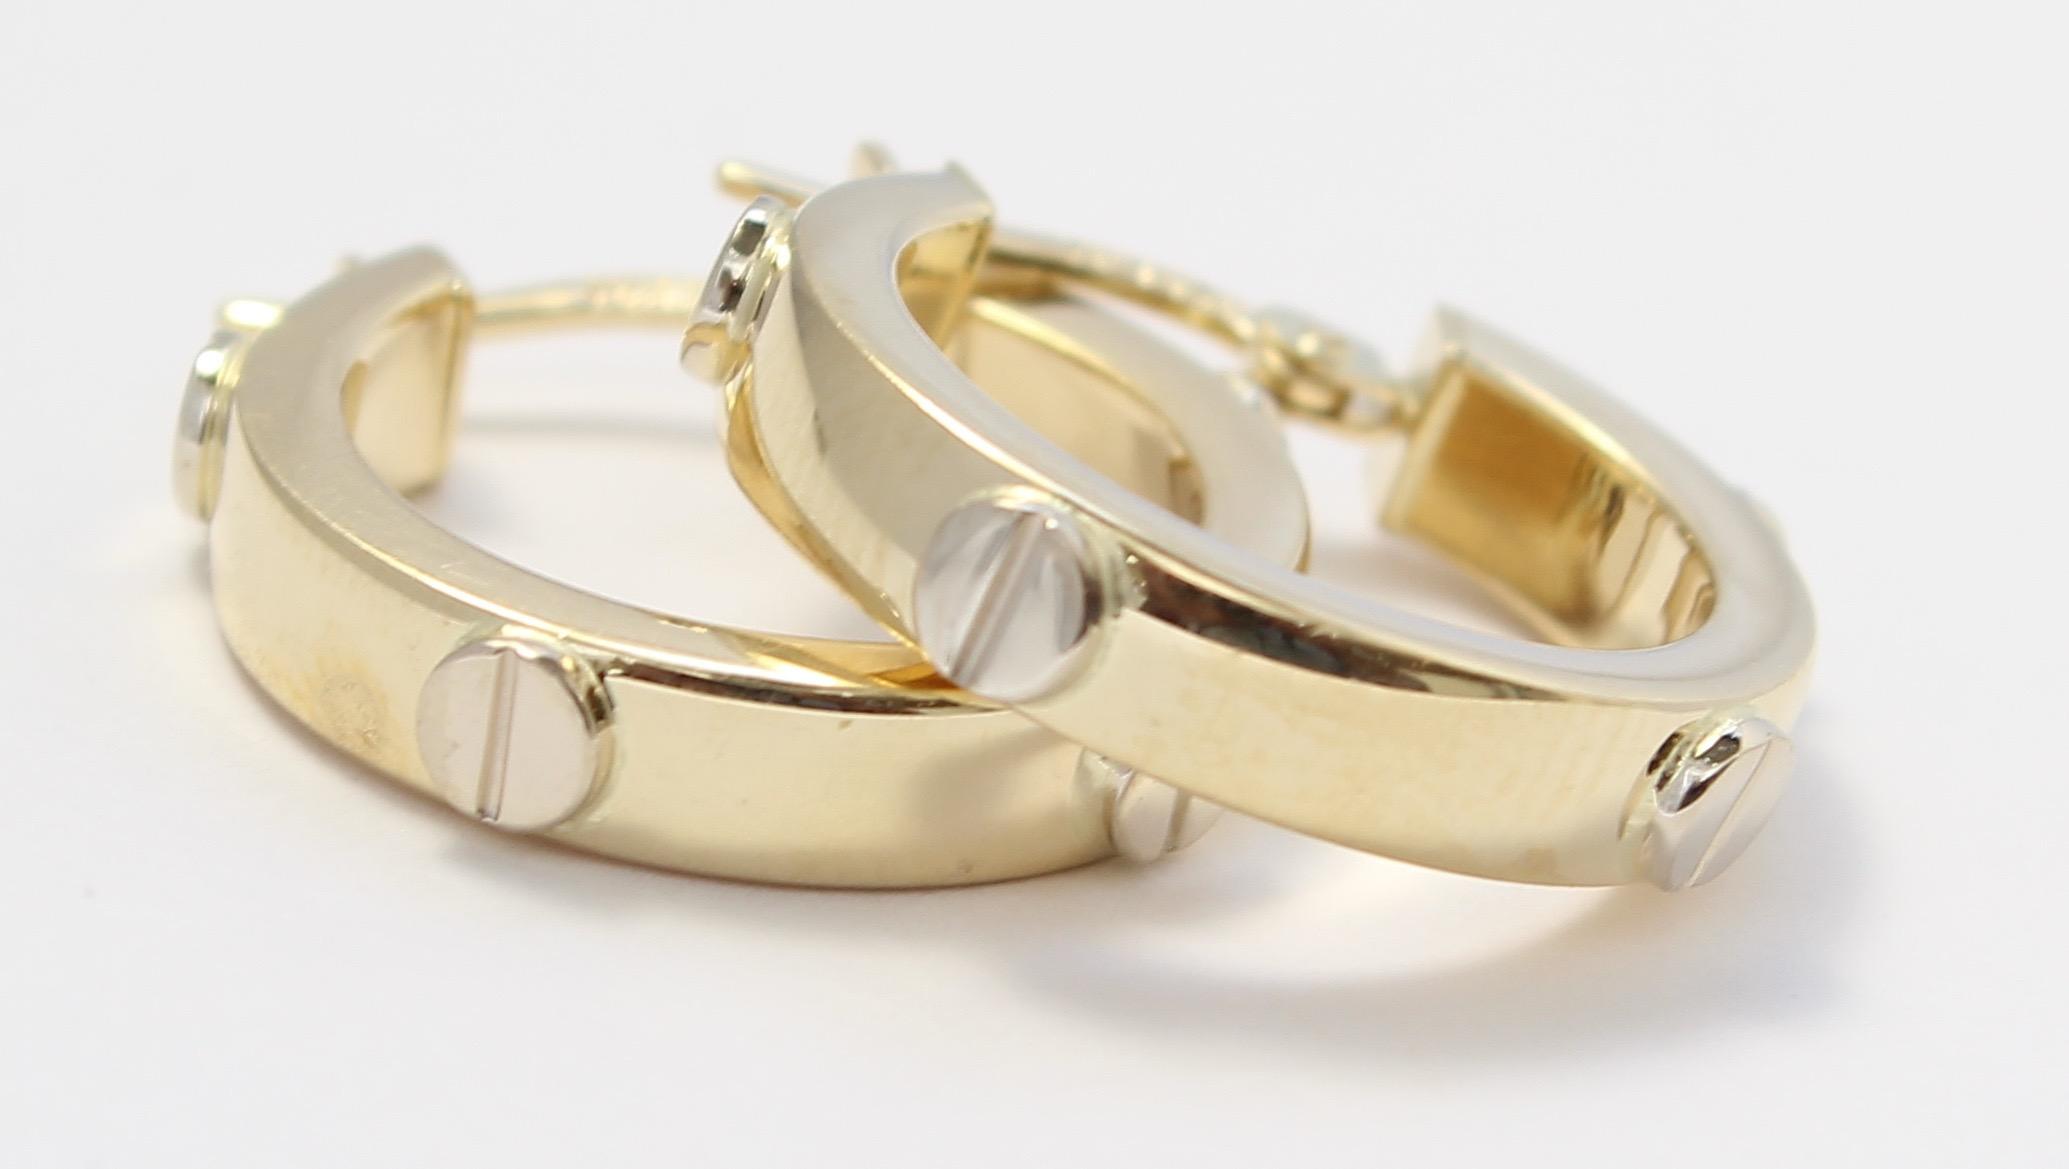 Image Is Loading 14k Yellow Gold Style Las Hoop Earrings